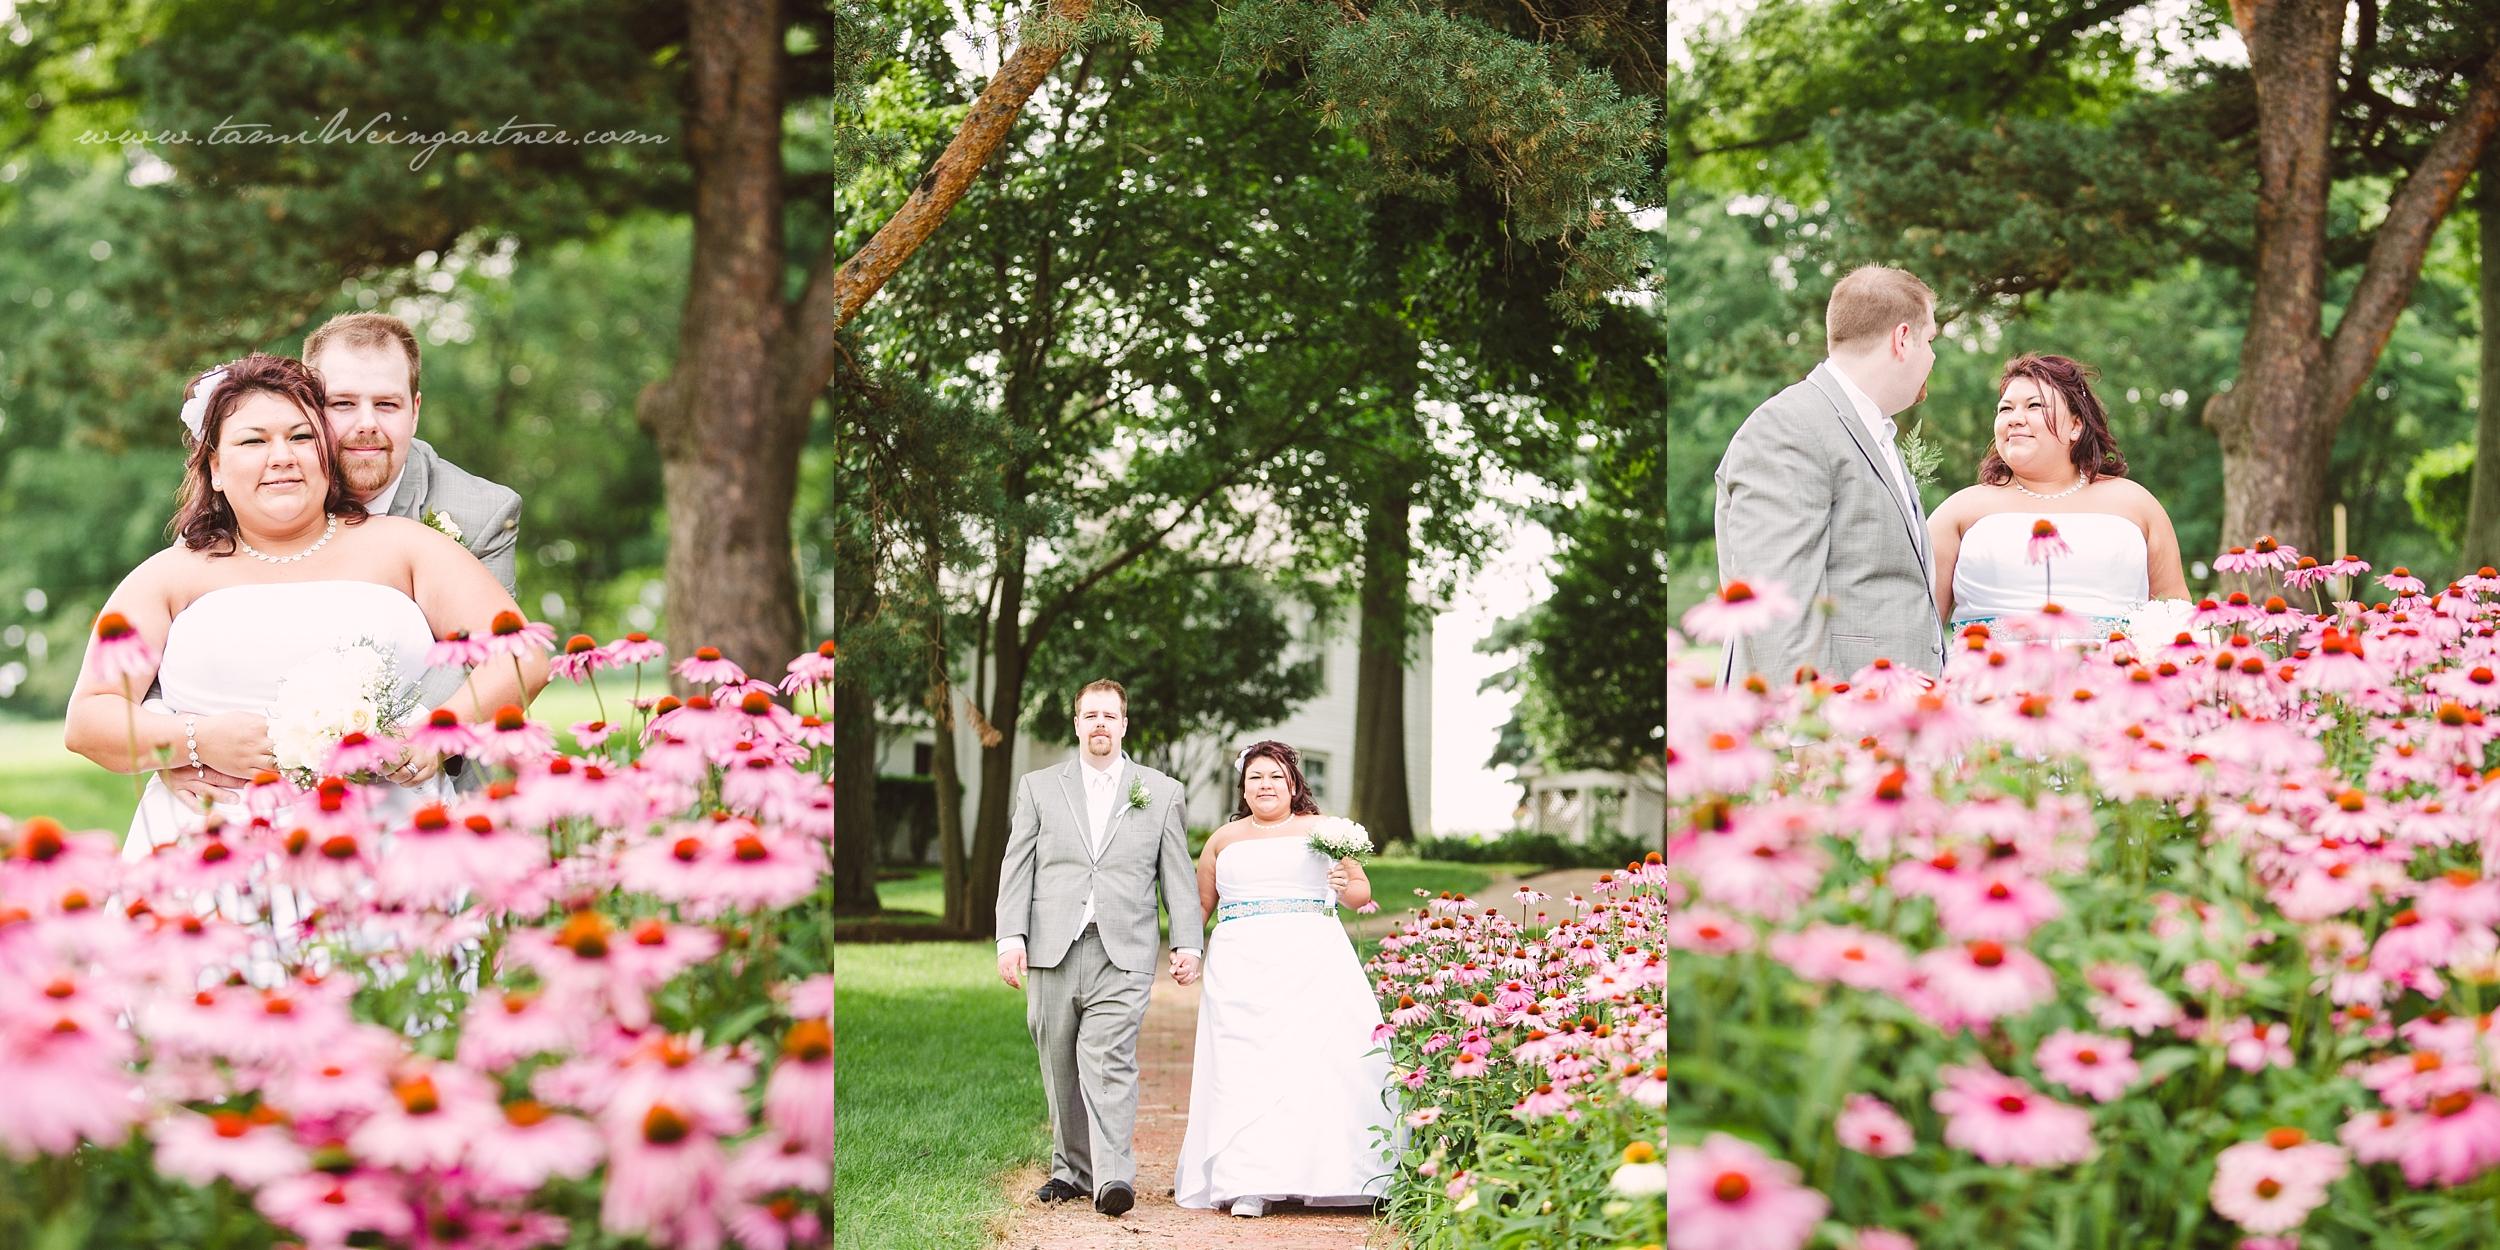 Youngstown Ohio weddding at Boardman Park Gardens in Poland